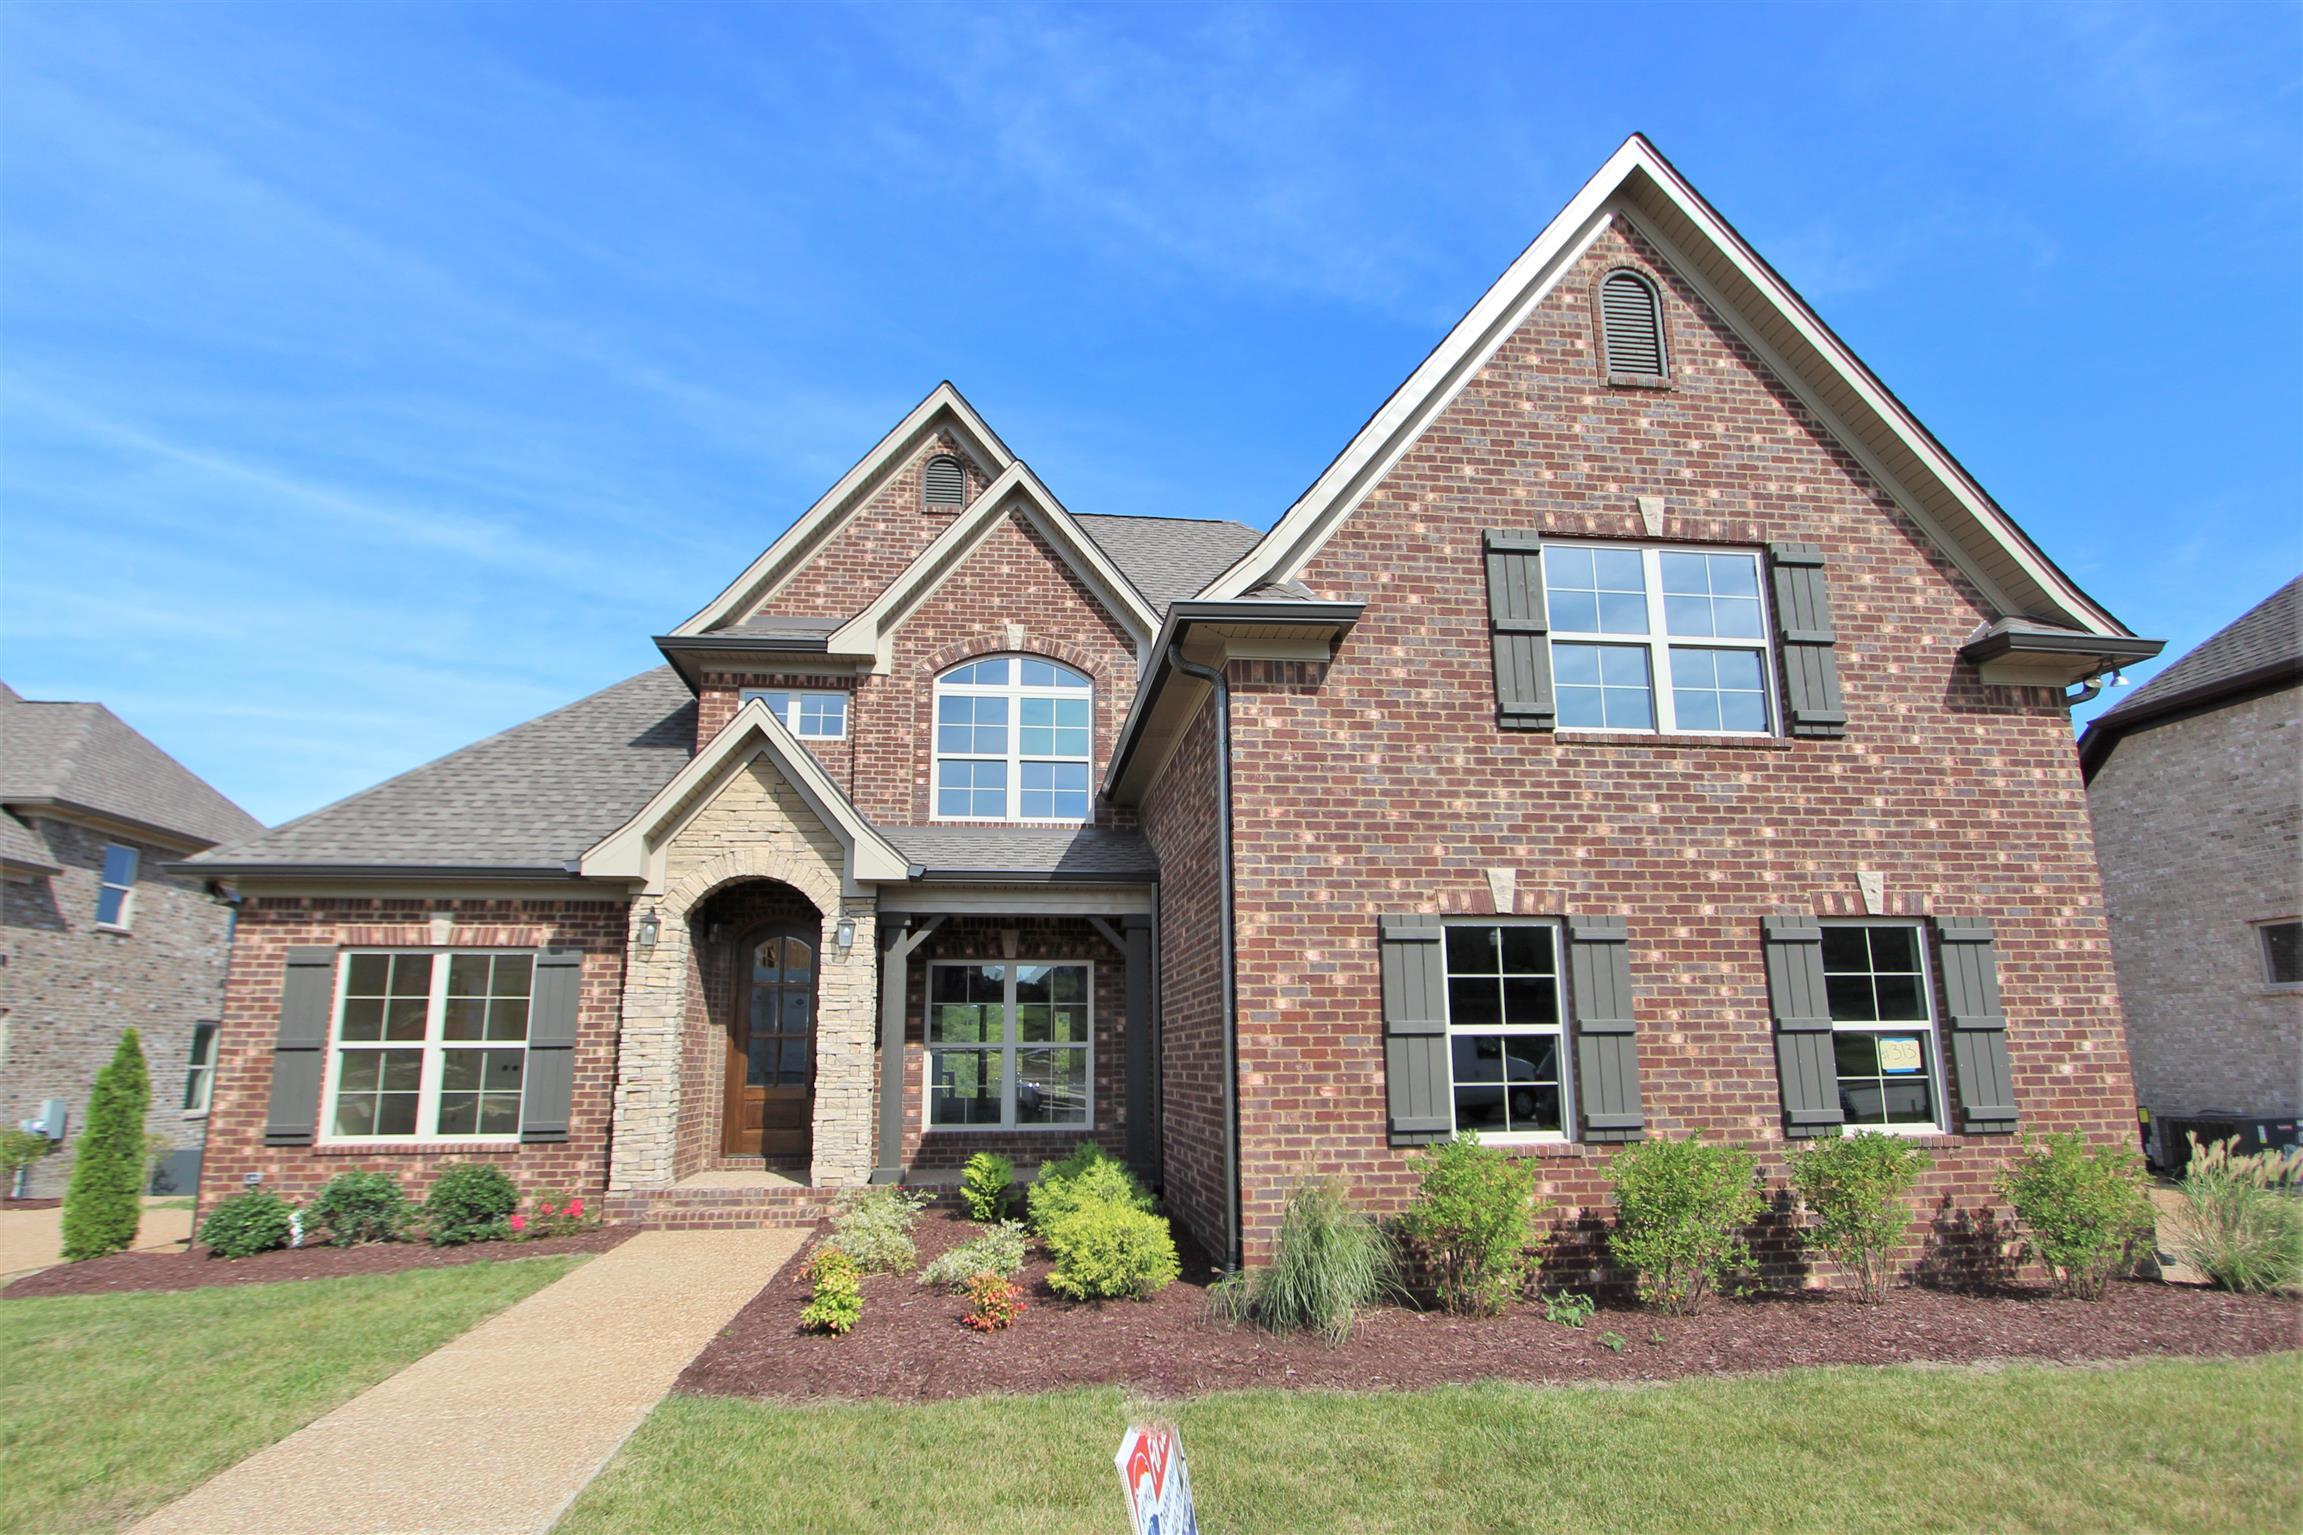 607 Montrose Dr.#313, Mount Juliet, TN 37122 - Mount Juliet, TN real estate listing